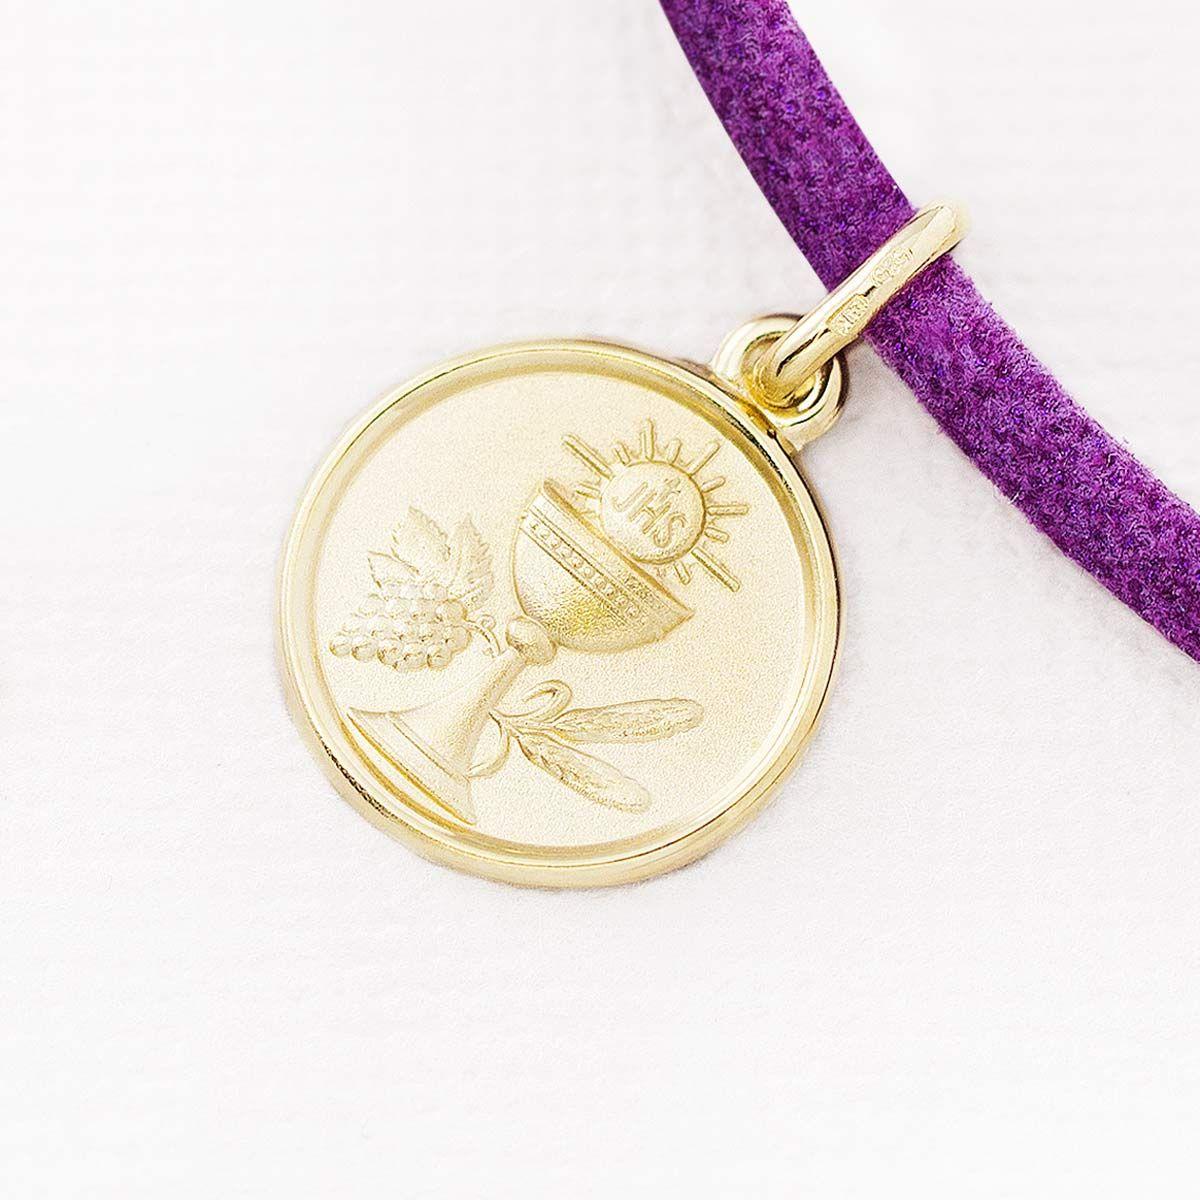 5eae5b144c1d Medalla de comunión en oro 18k. Este diseño de colgante de comunión Argyor  incluye Cáliz